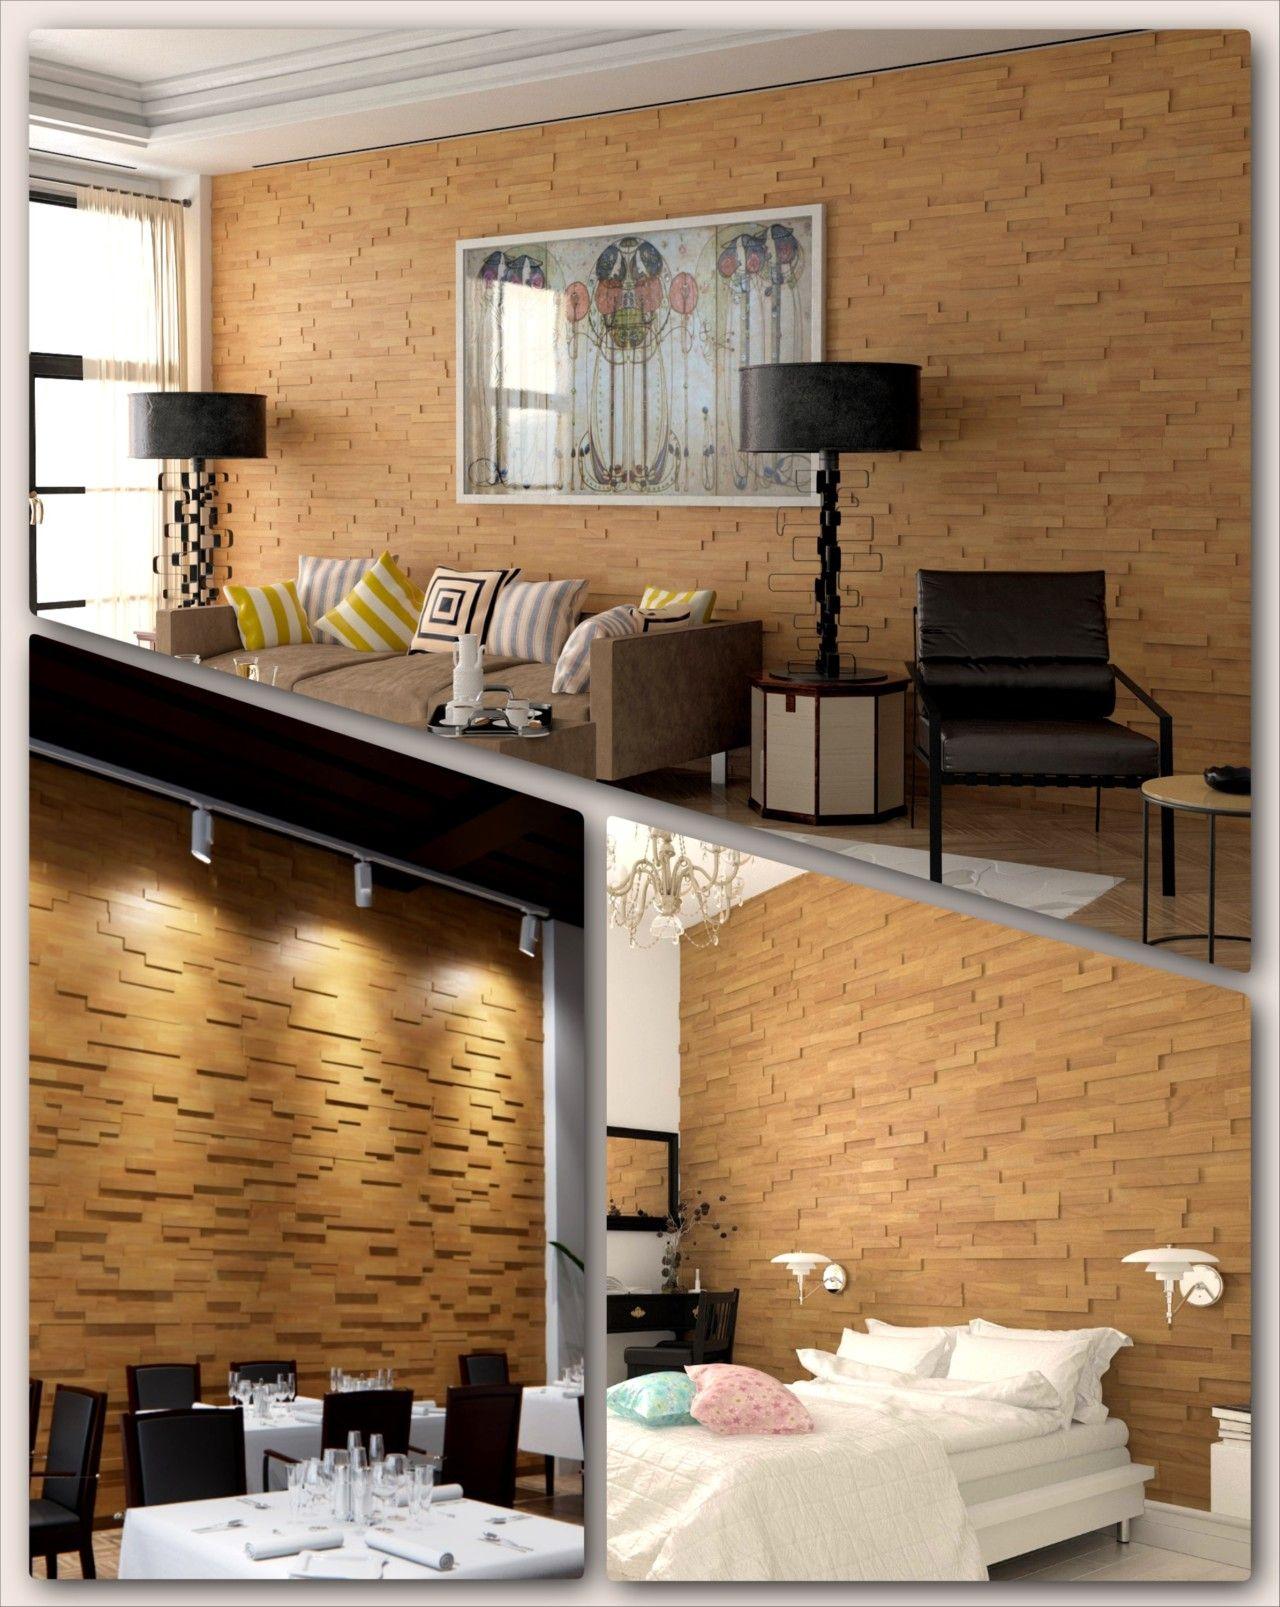 Living Room Walls Wood Panels: 3D Wood Wall Panels For Interior